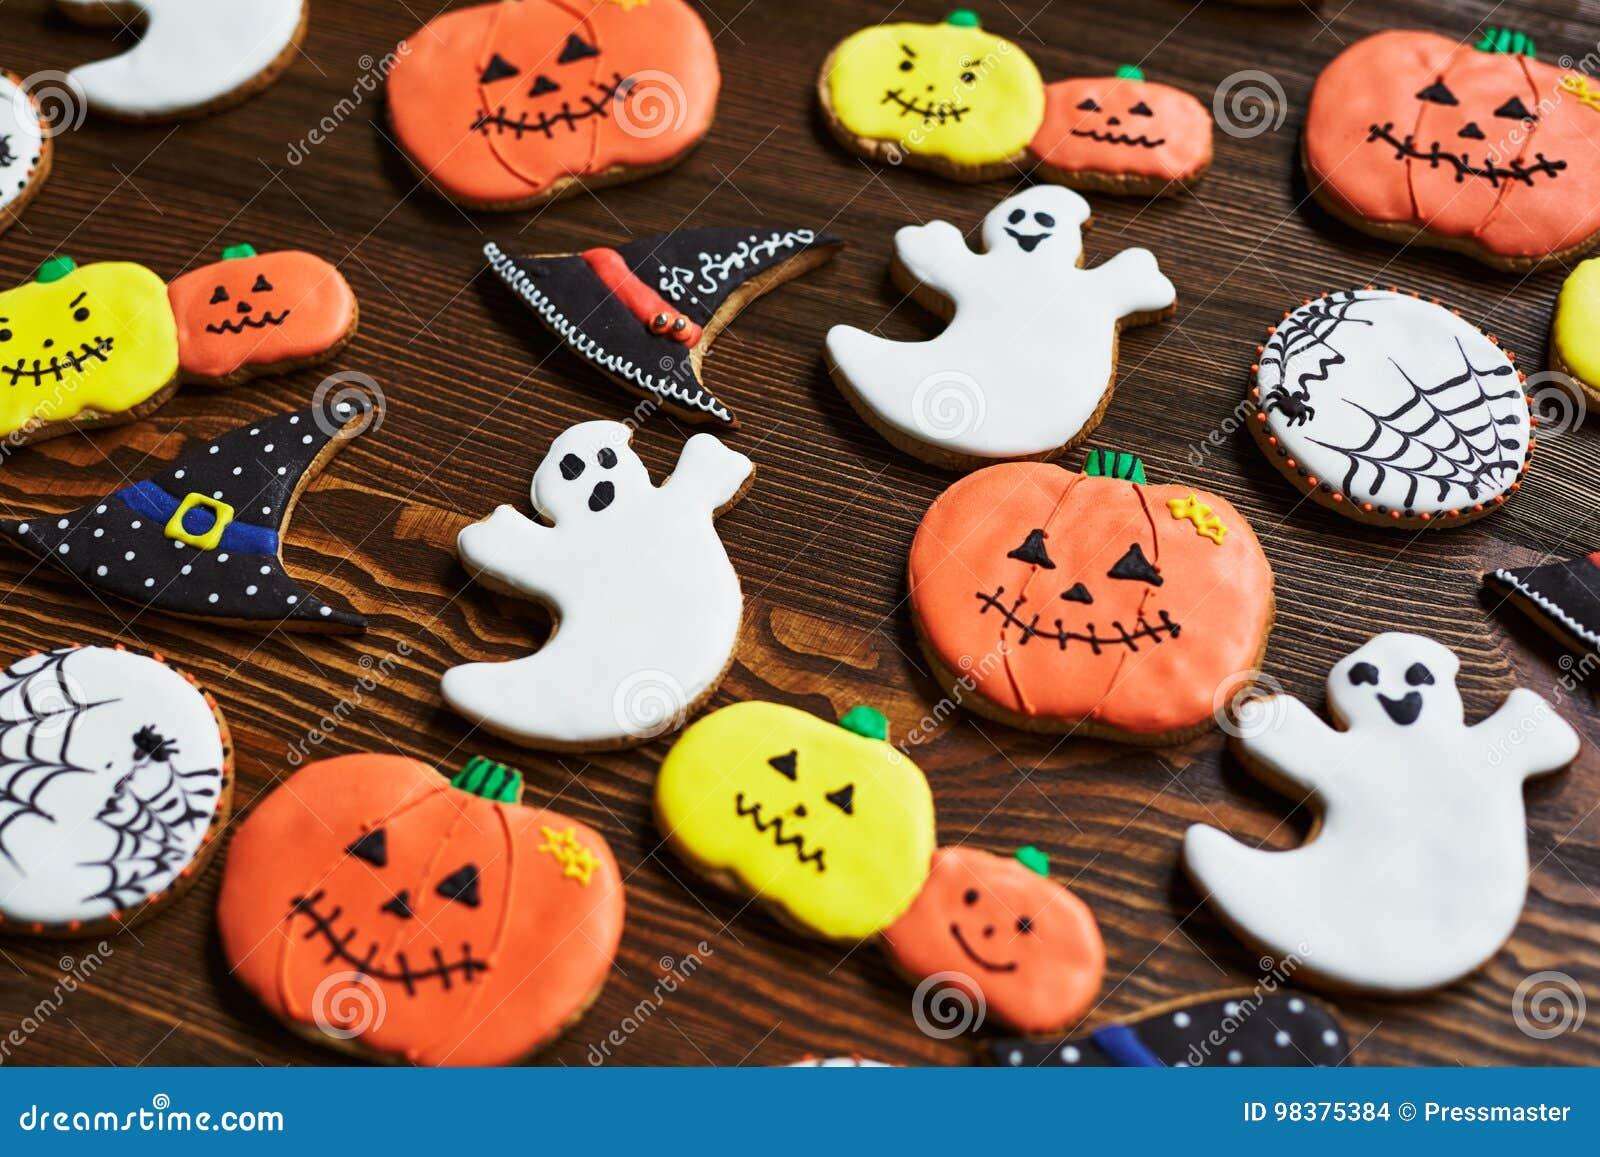 Fondant Halloween Decorations.Halloween Decorations Stock Photo Image Of Snack Occasion 98375384